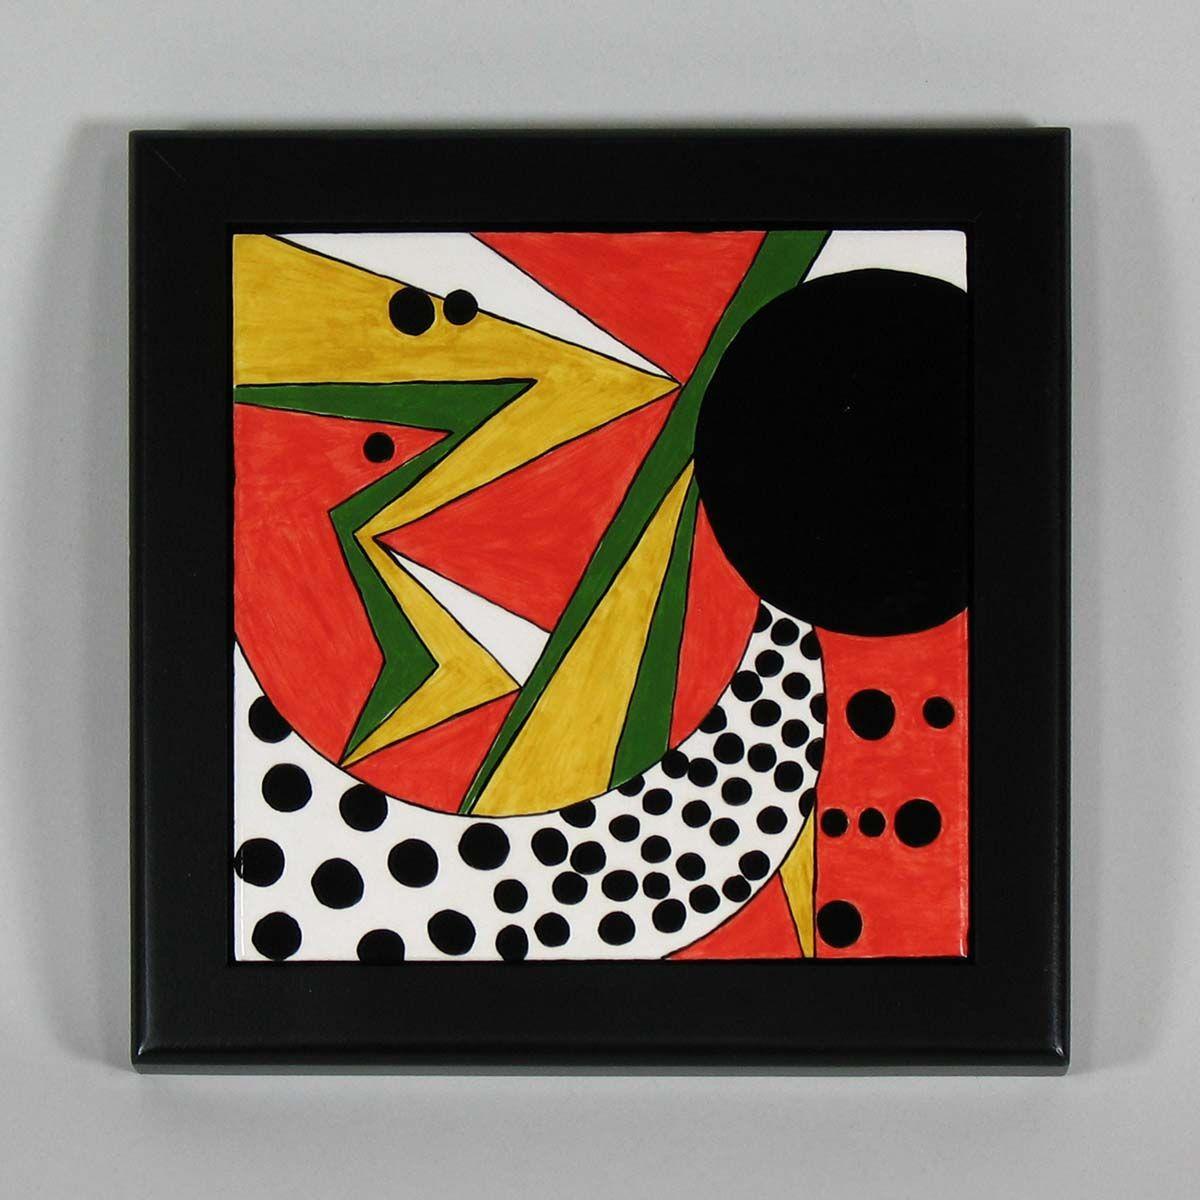 Black wood and ceramic tile trivet tiles frames pinterest black wood and ceramic tile trivet dailygadgetfo Choice Image